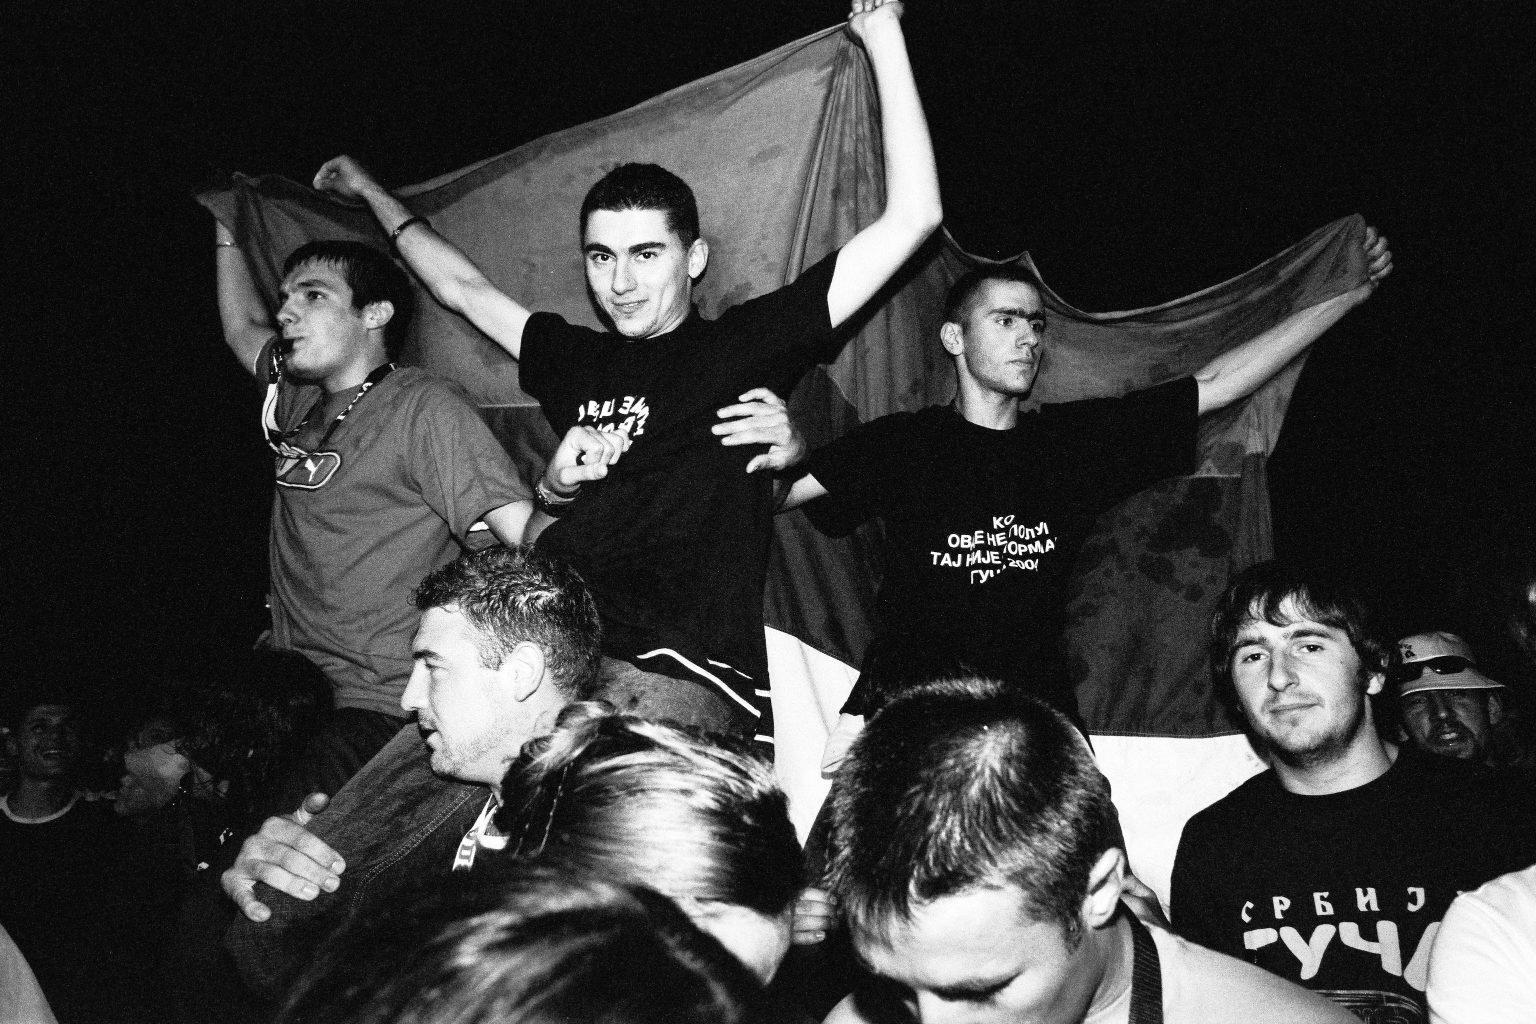 Fans – Guča, Dragačevski Sabor